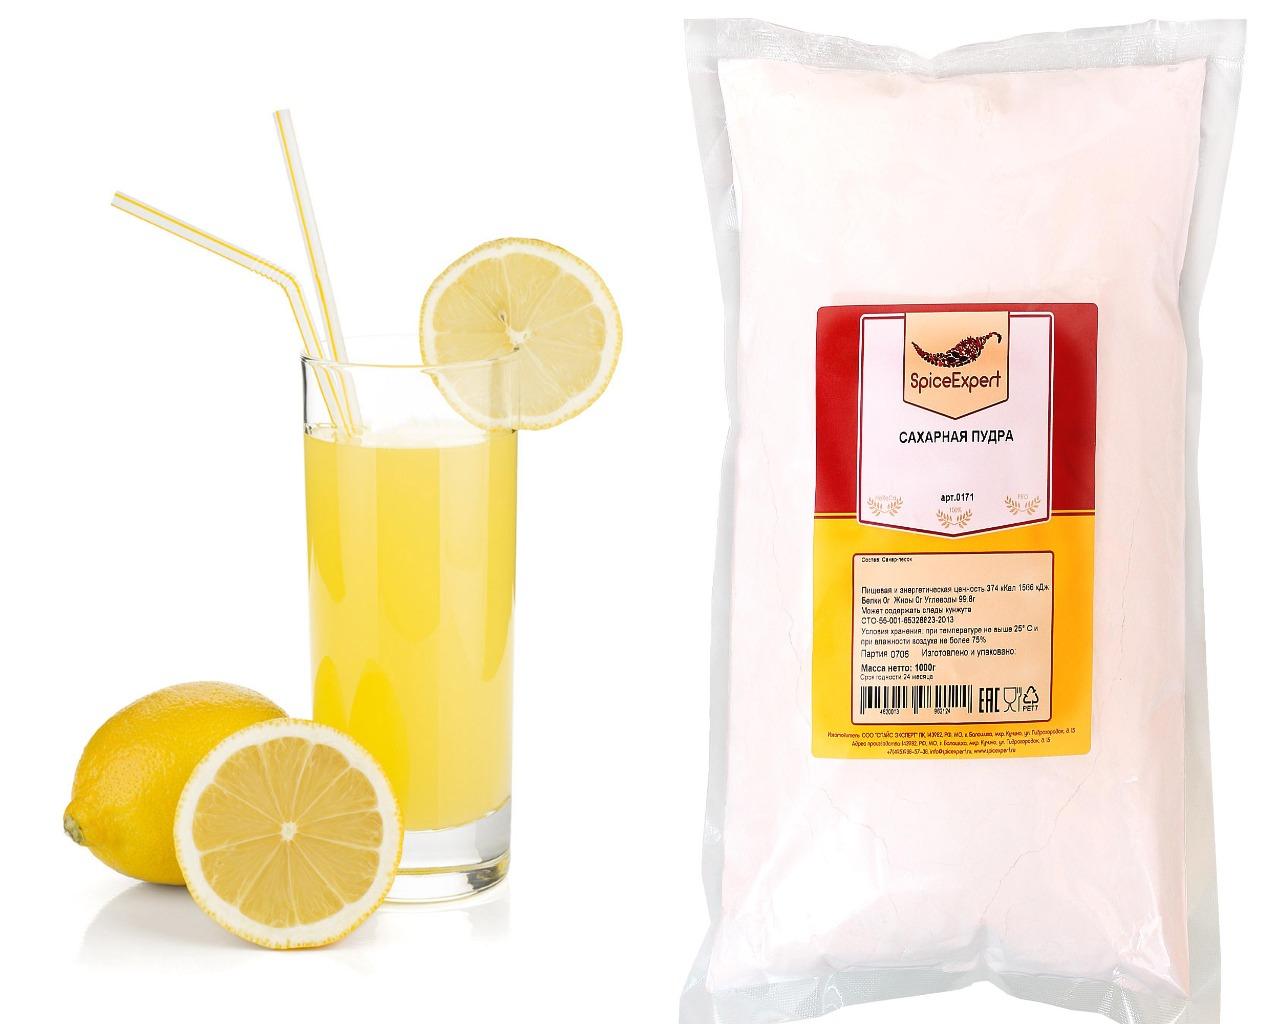 Saharnaya-pudra-i-limonnyj-sok1 Как покрыть печенье глазурью